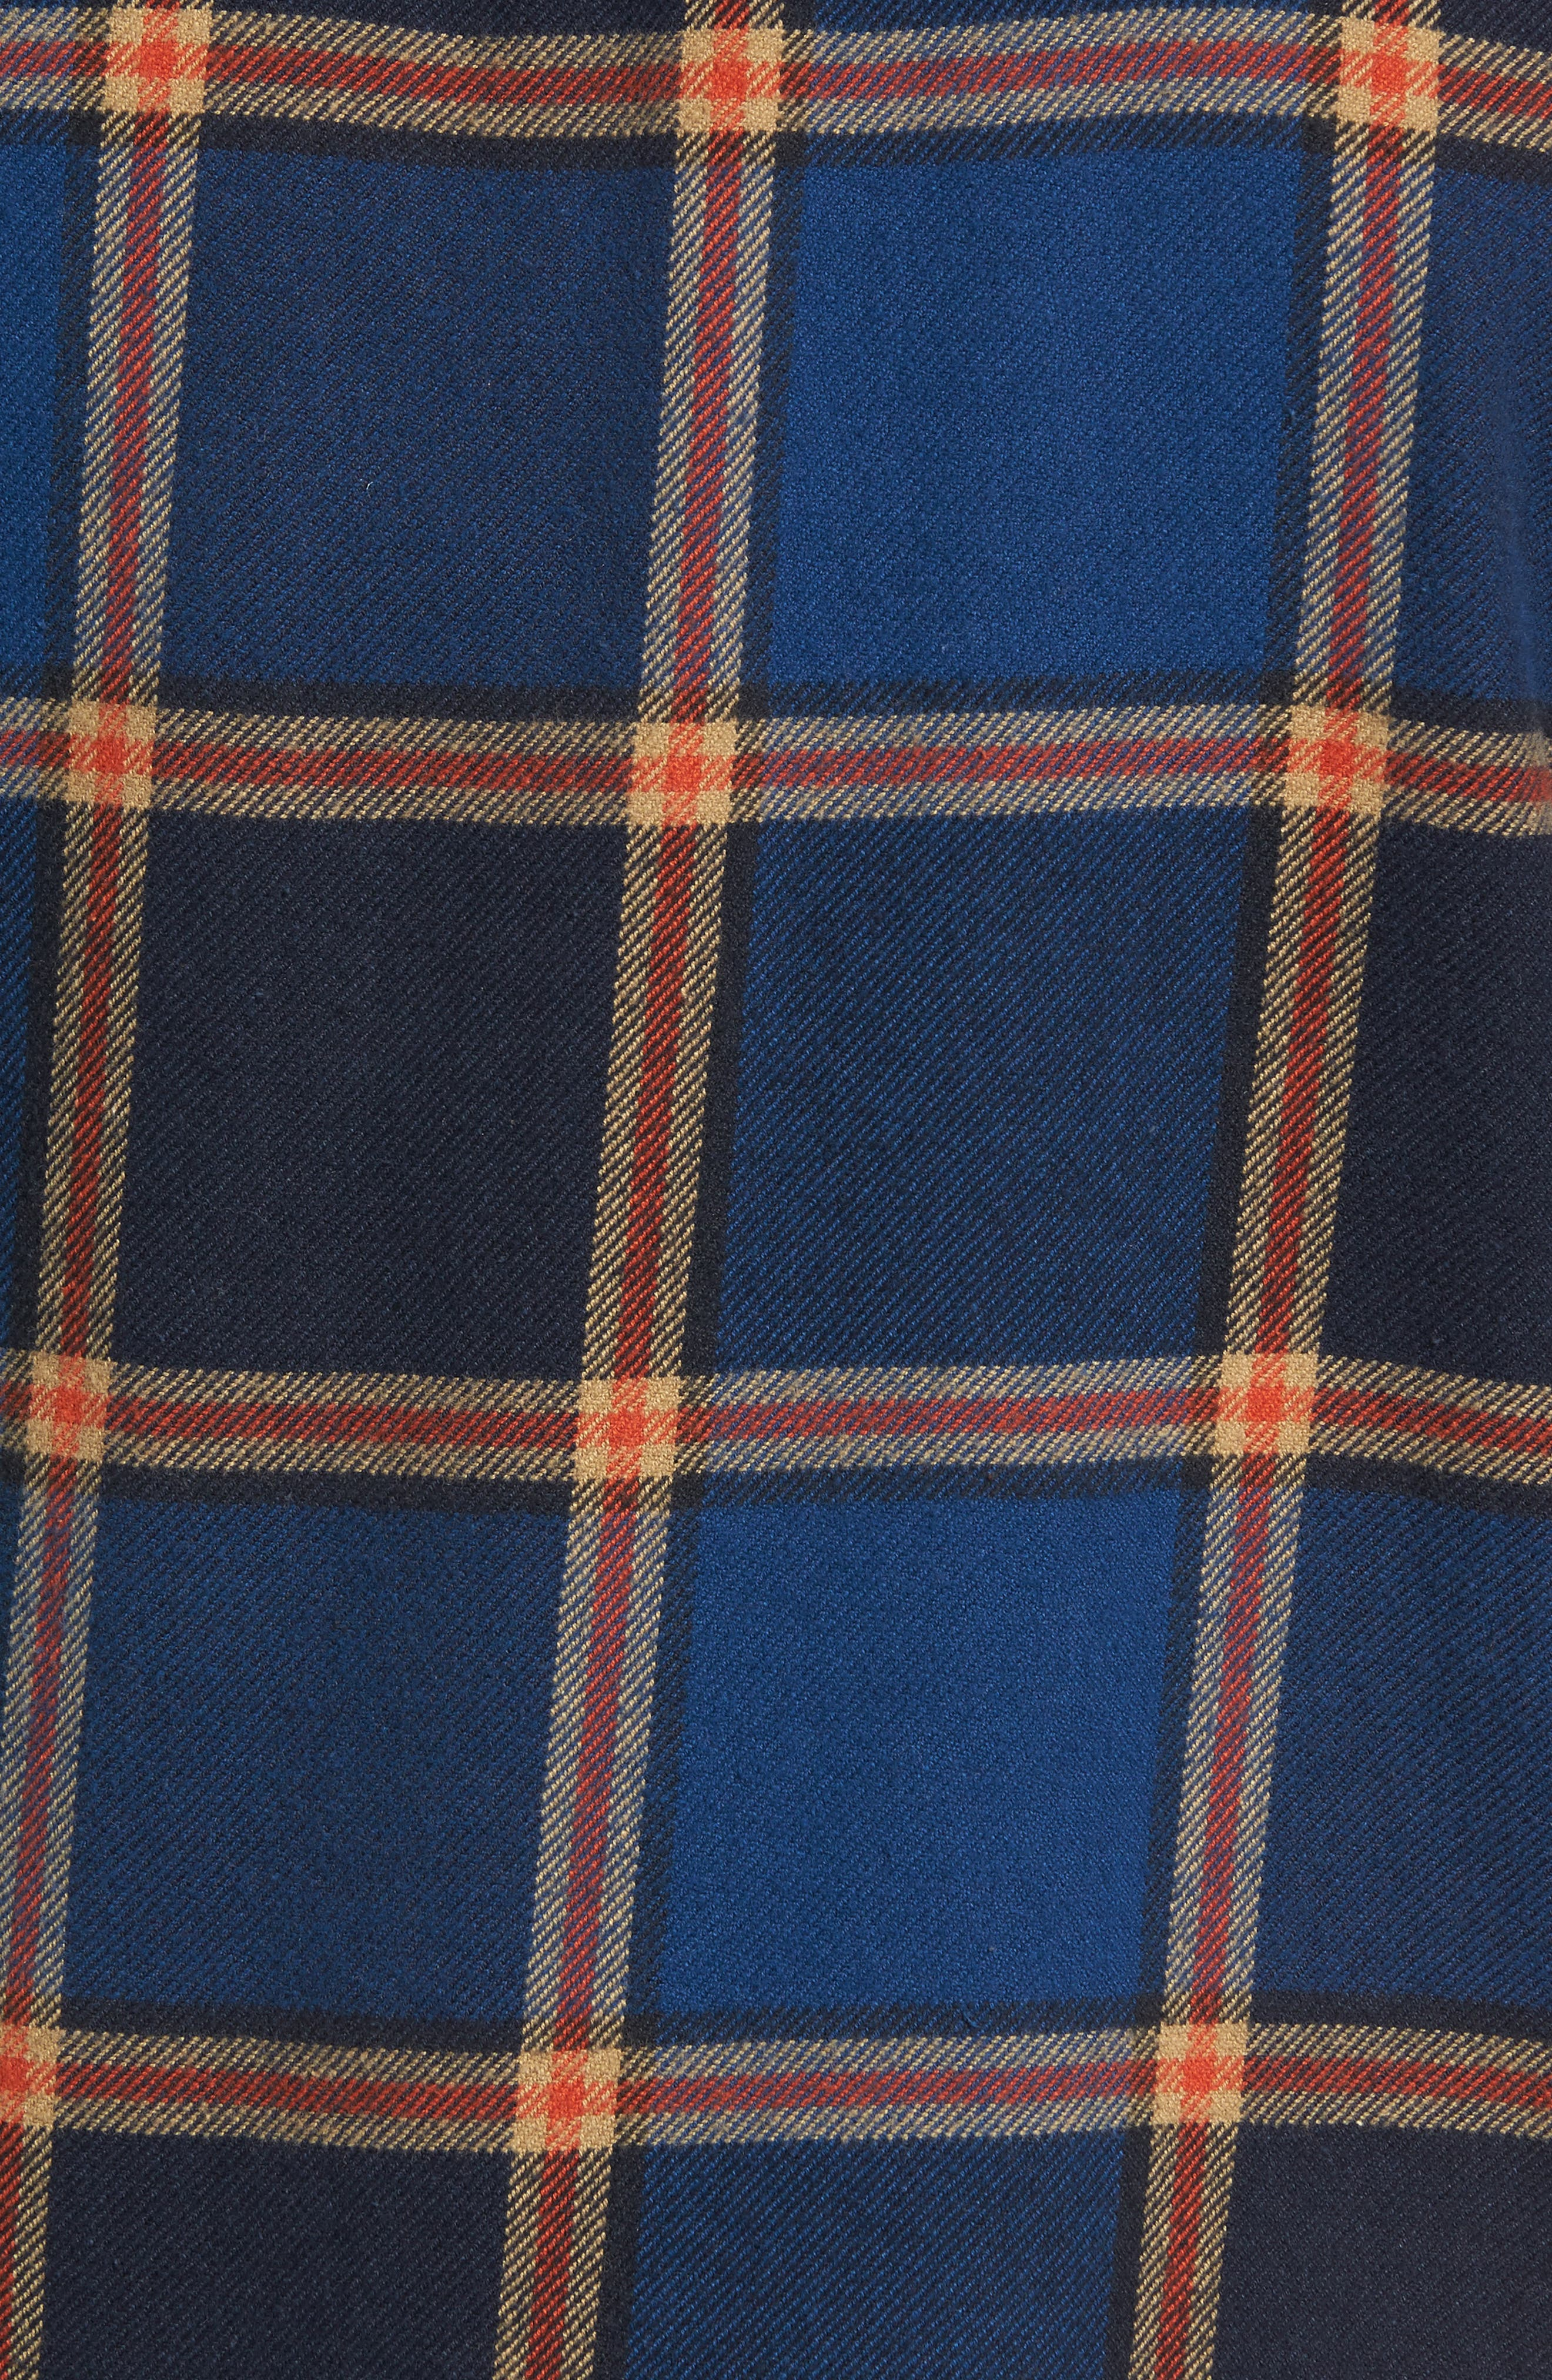 R1 Check Twill Shirt Jacket,                             Alternate thumbnail 5, color,                             410